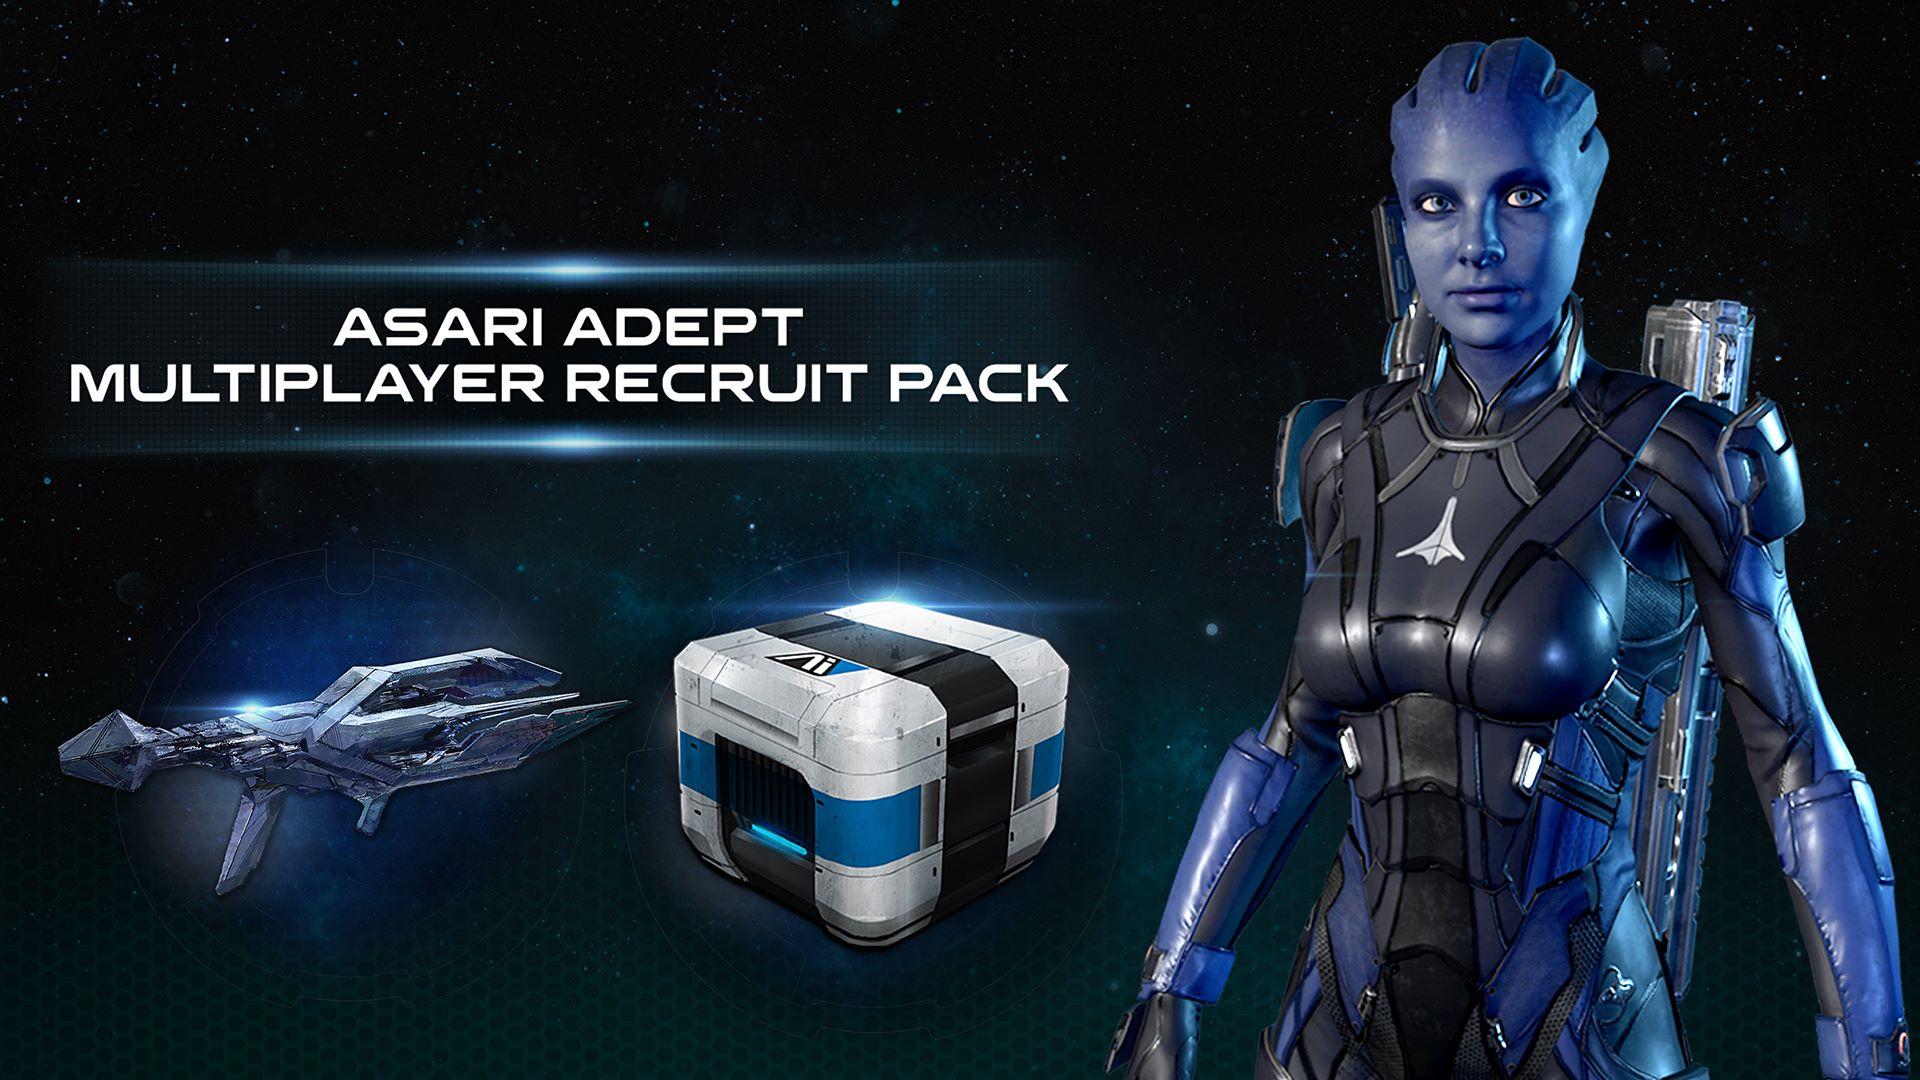 Mass Effect™: Andromeda - Paquete multijugador de recluta adepta asari